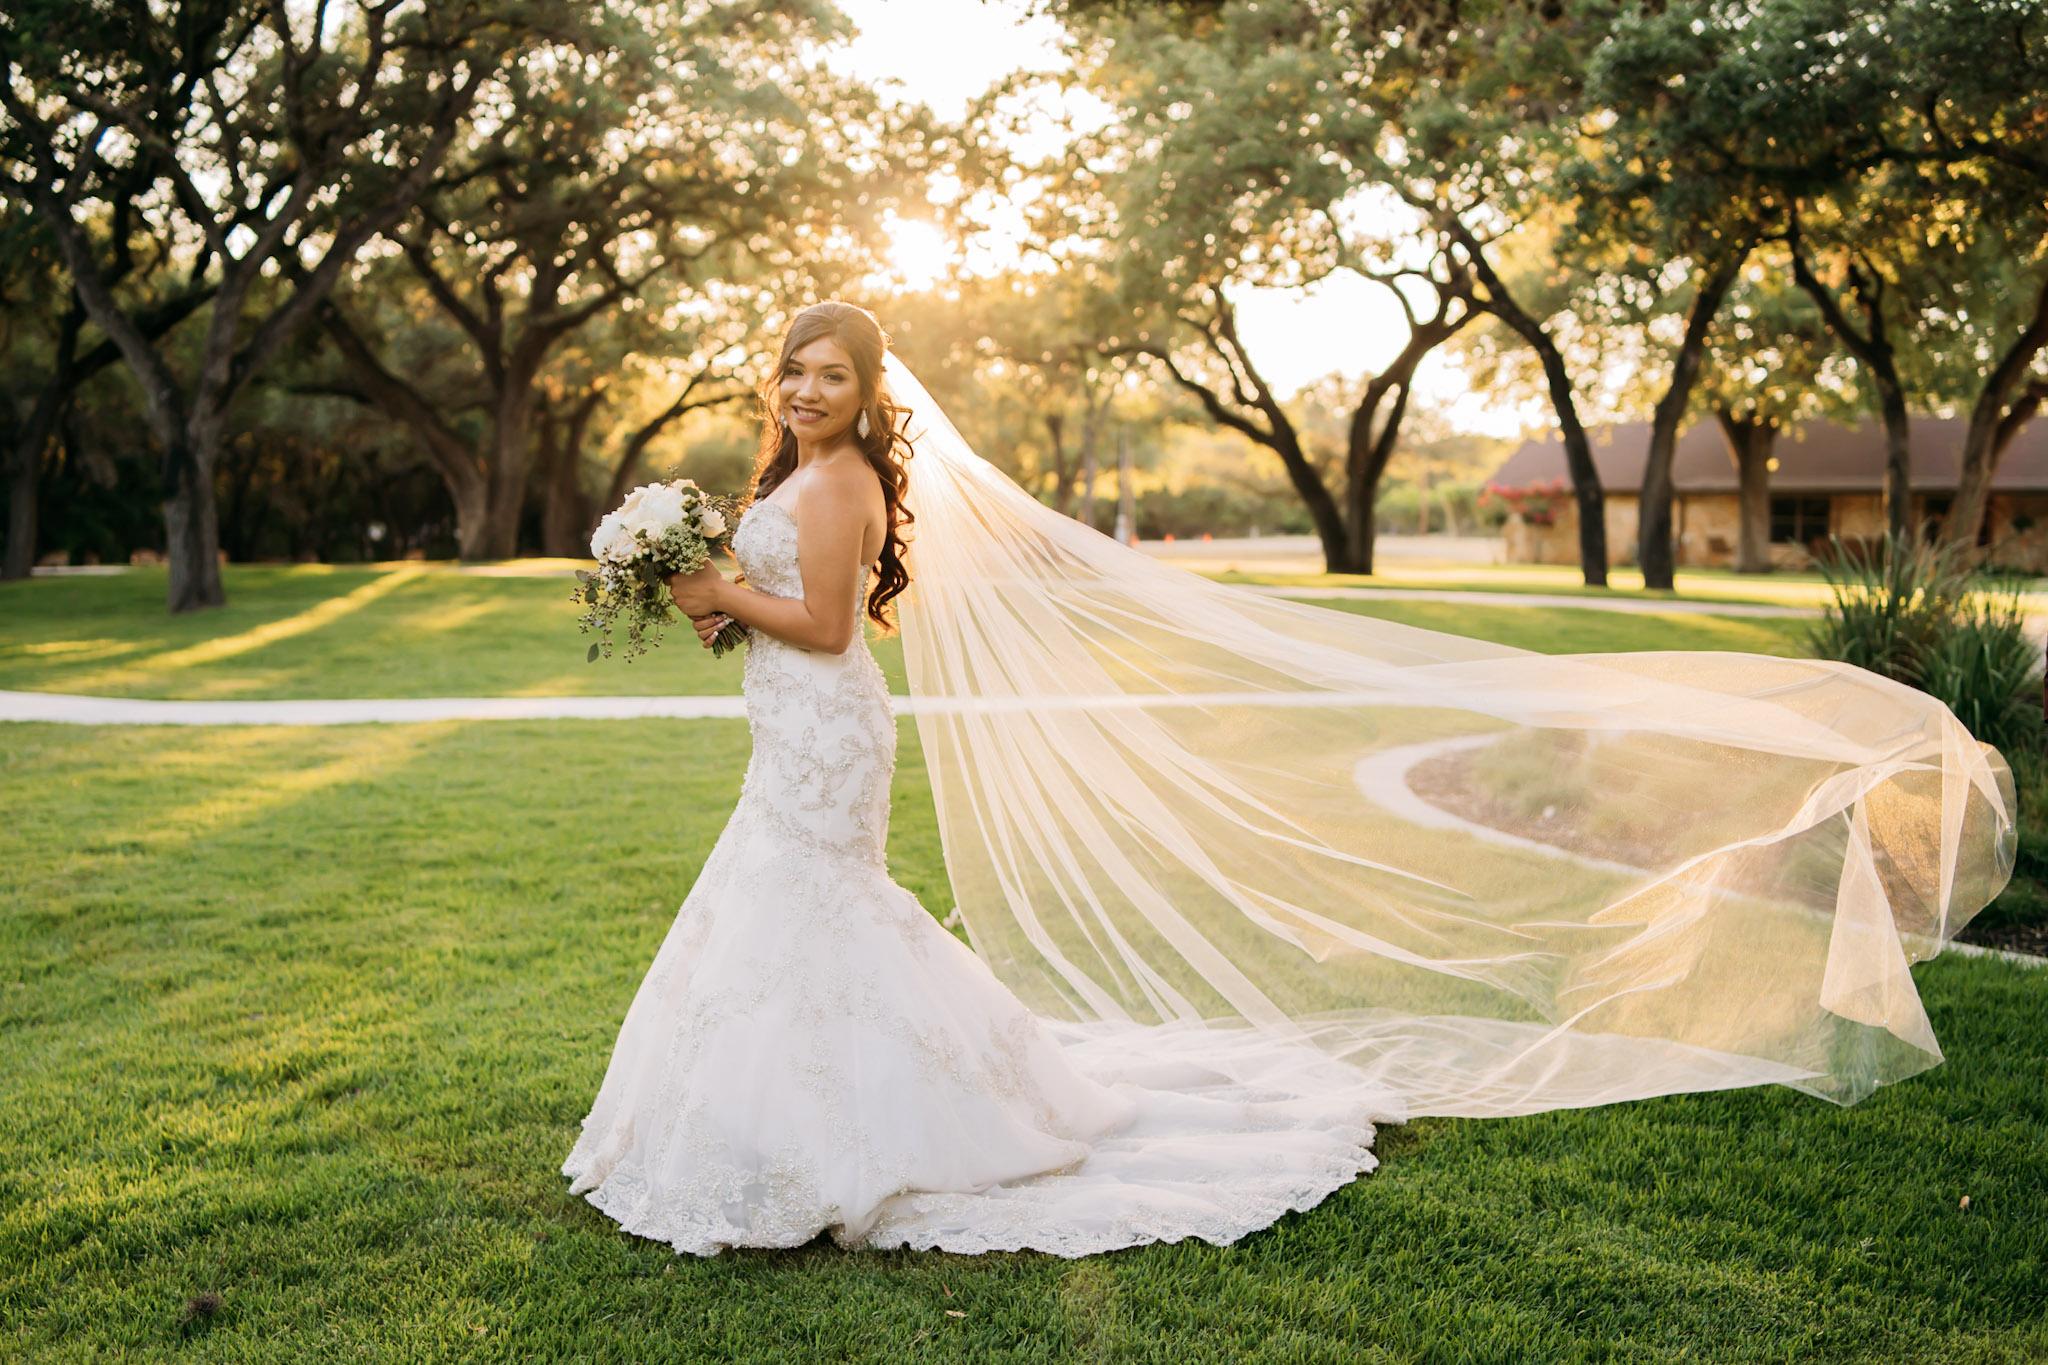 060718-A-JoeDel-Wedding-AdrianRGarcia-FOMAScine_AA98661.jpg